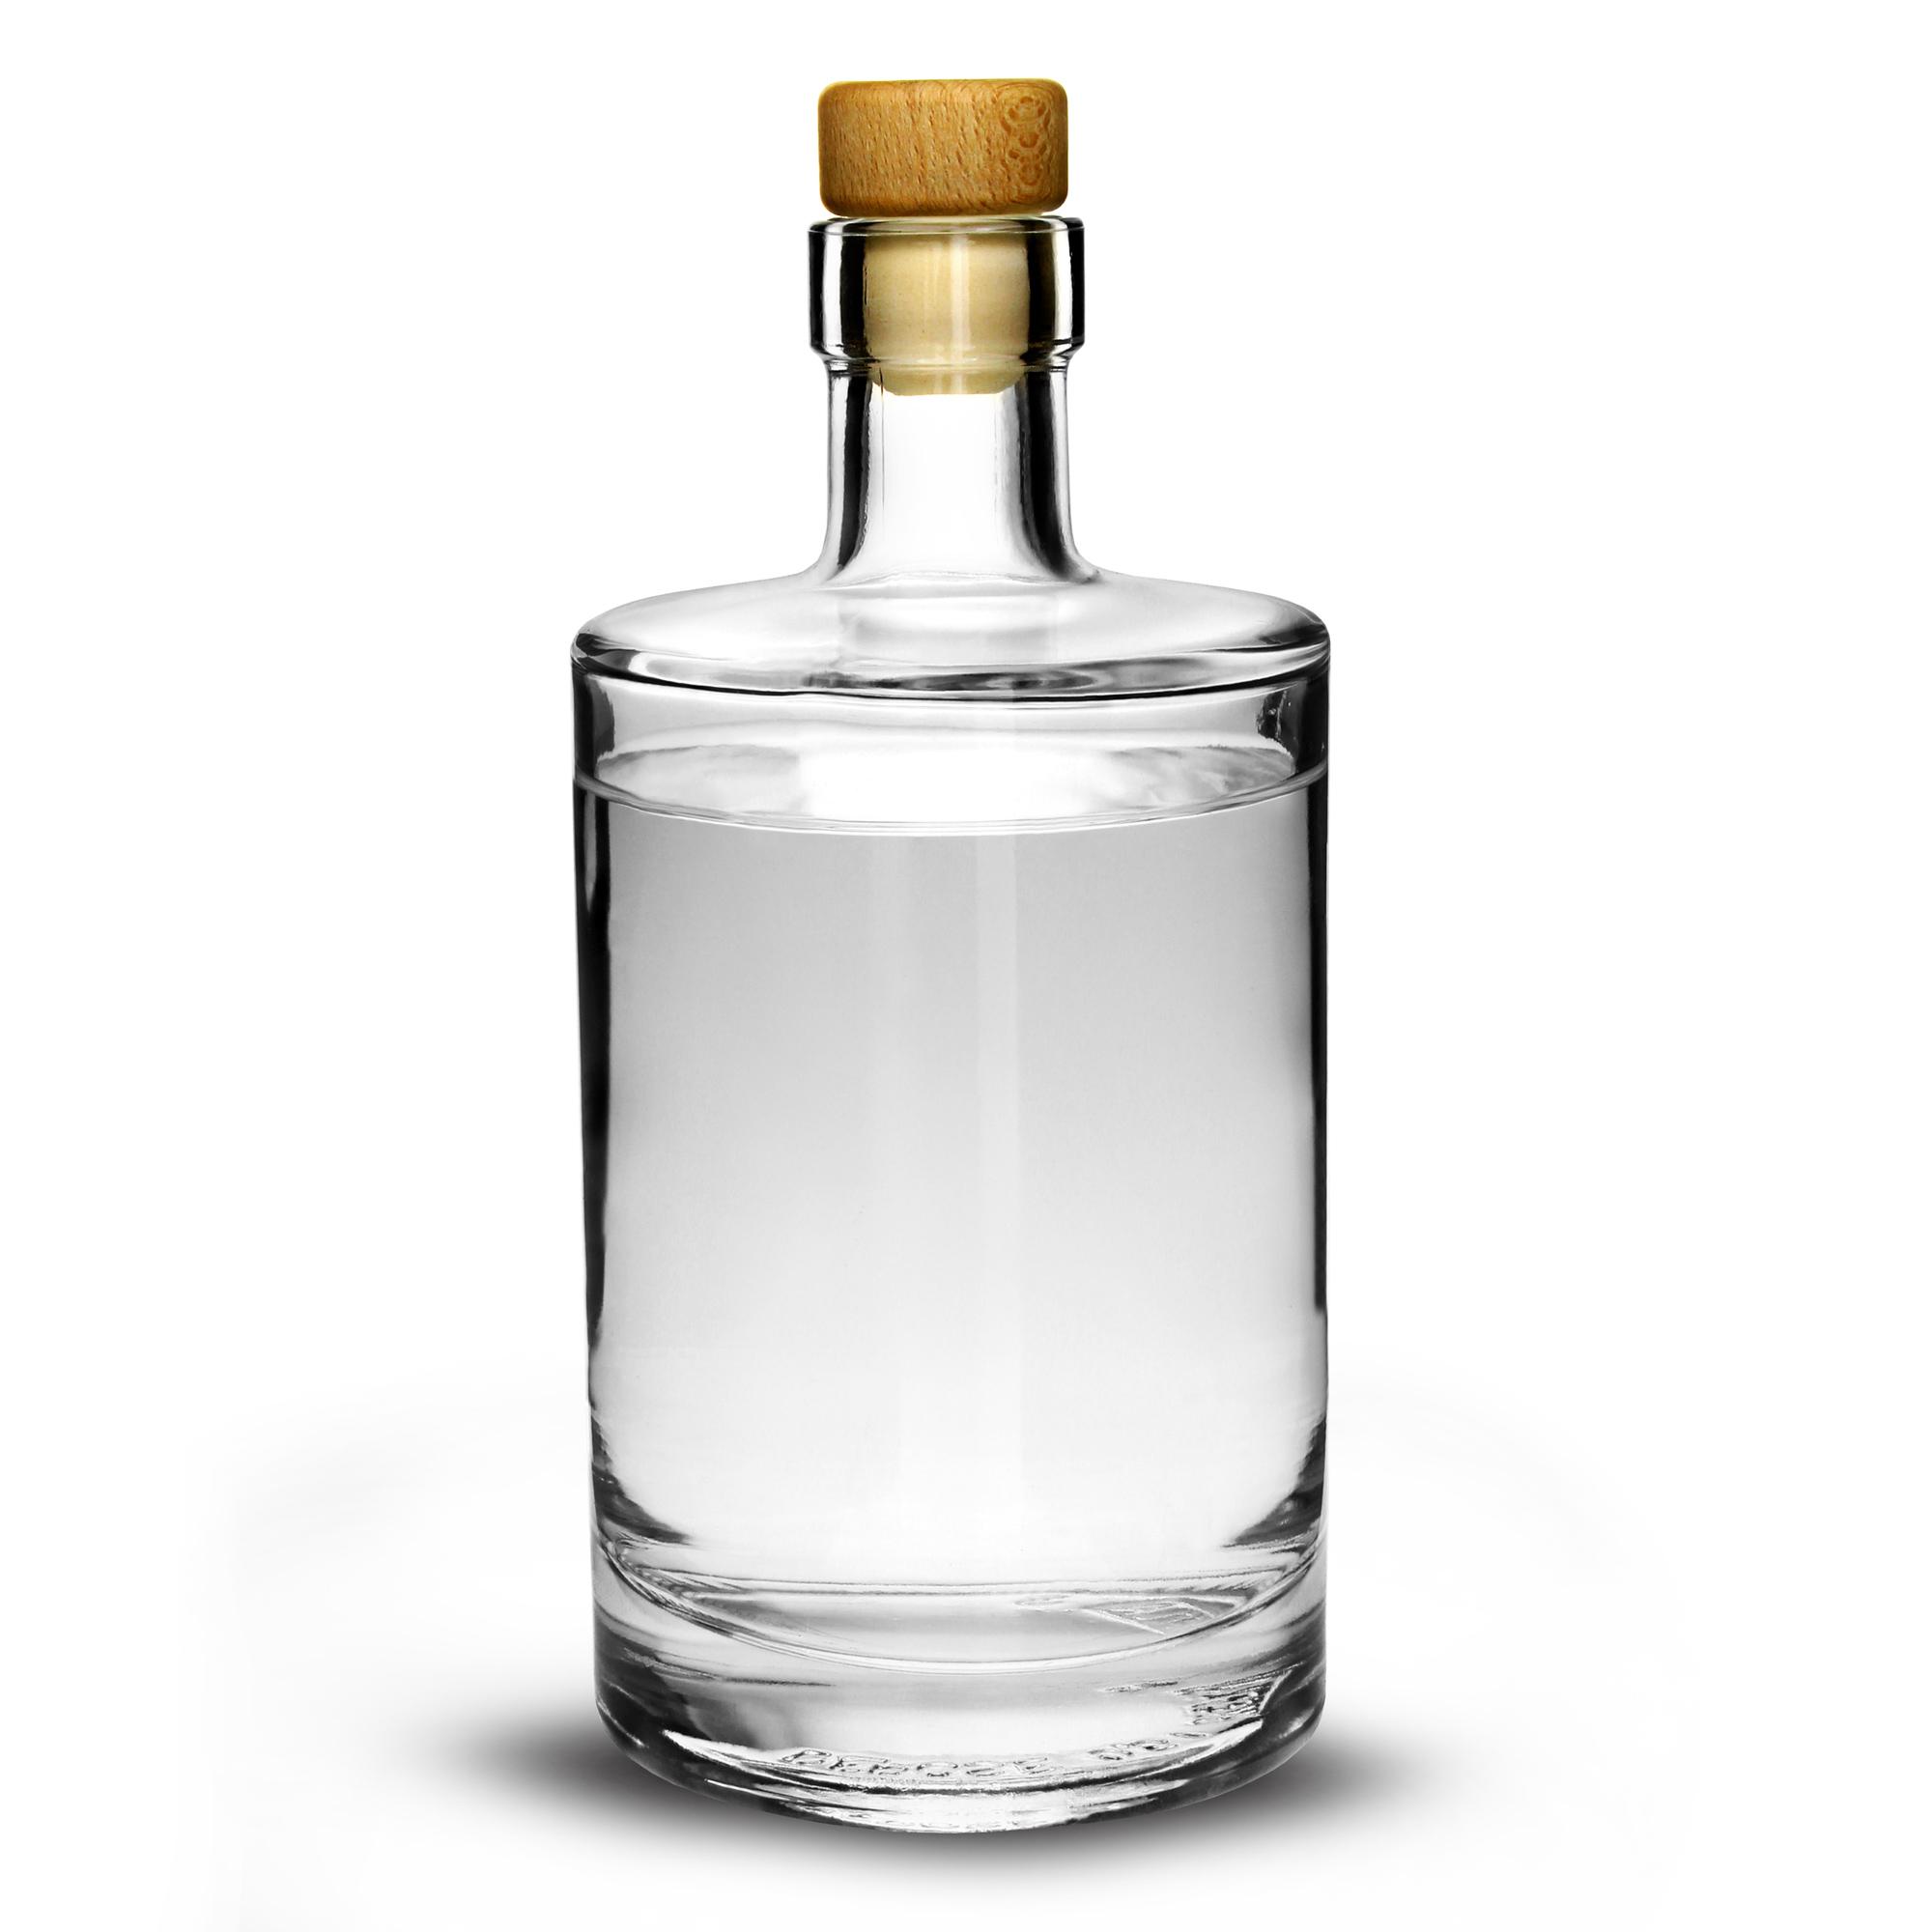 Galileo Flint Glass Bottle With Cork Lid 176oz 500ml